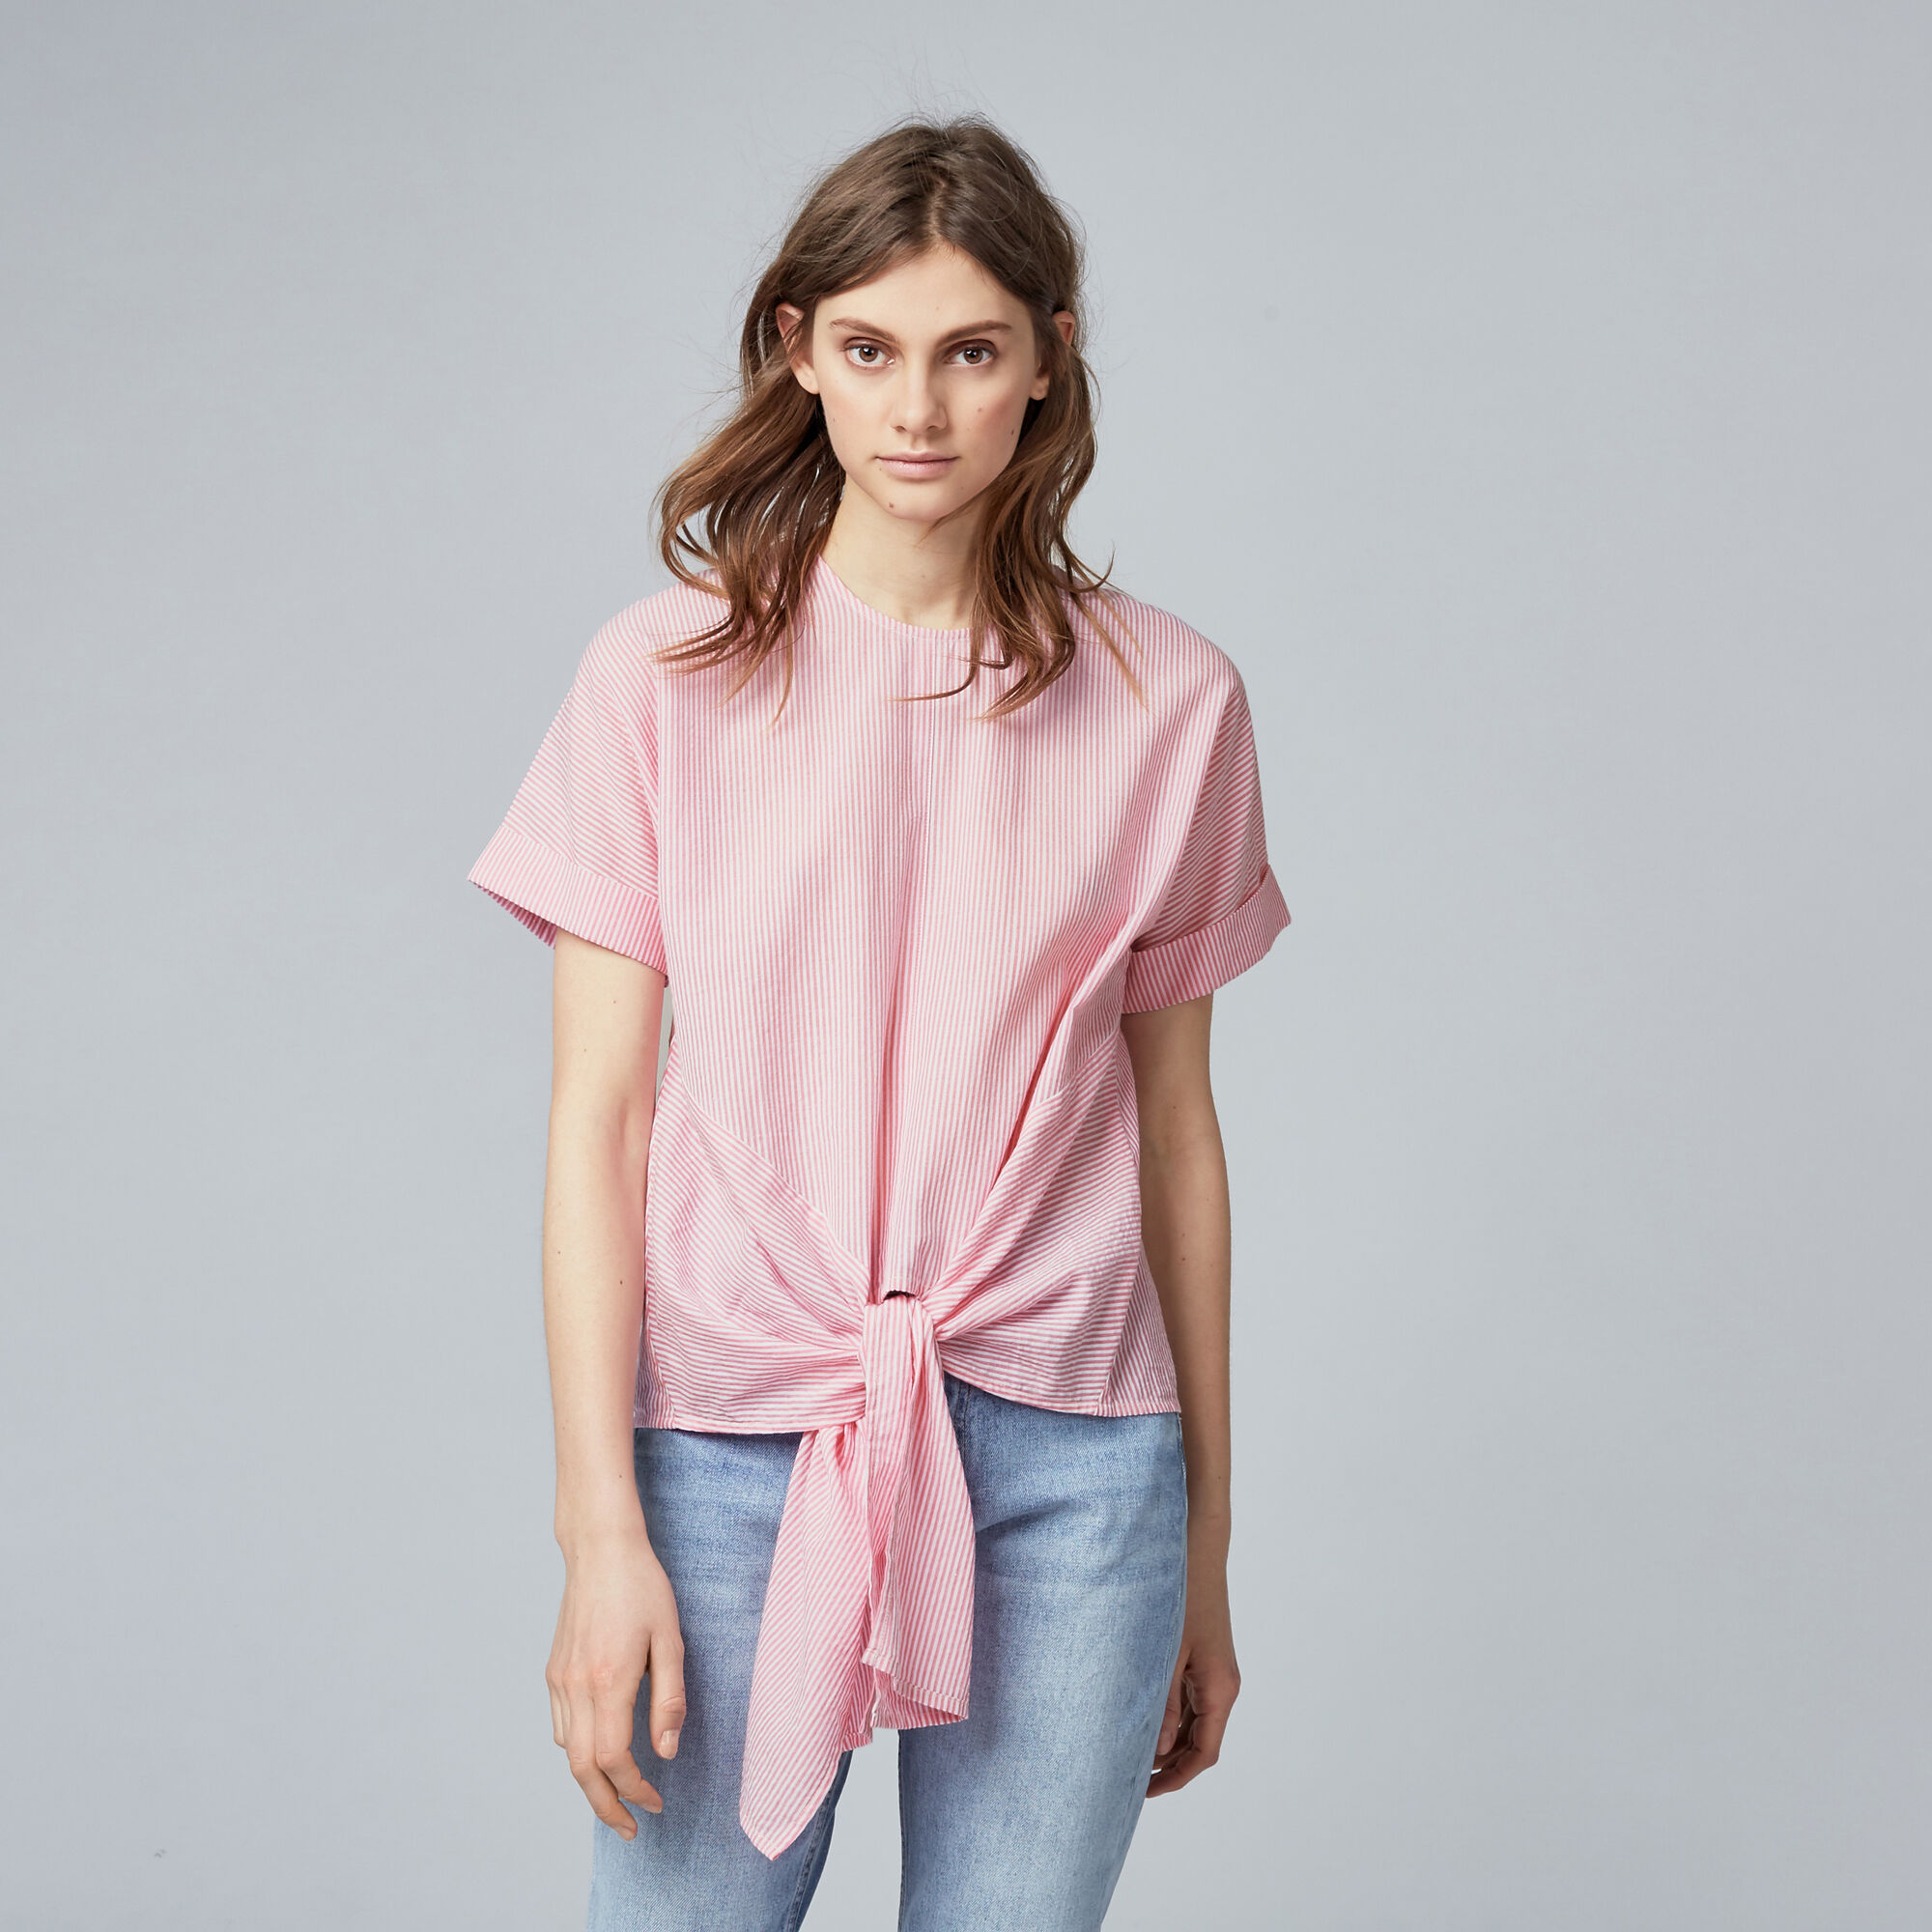 Warehouse, TIE FRONT STRIPE TOP Pink Stripe 1